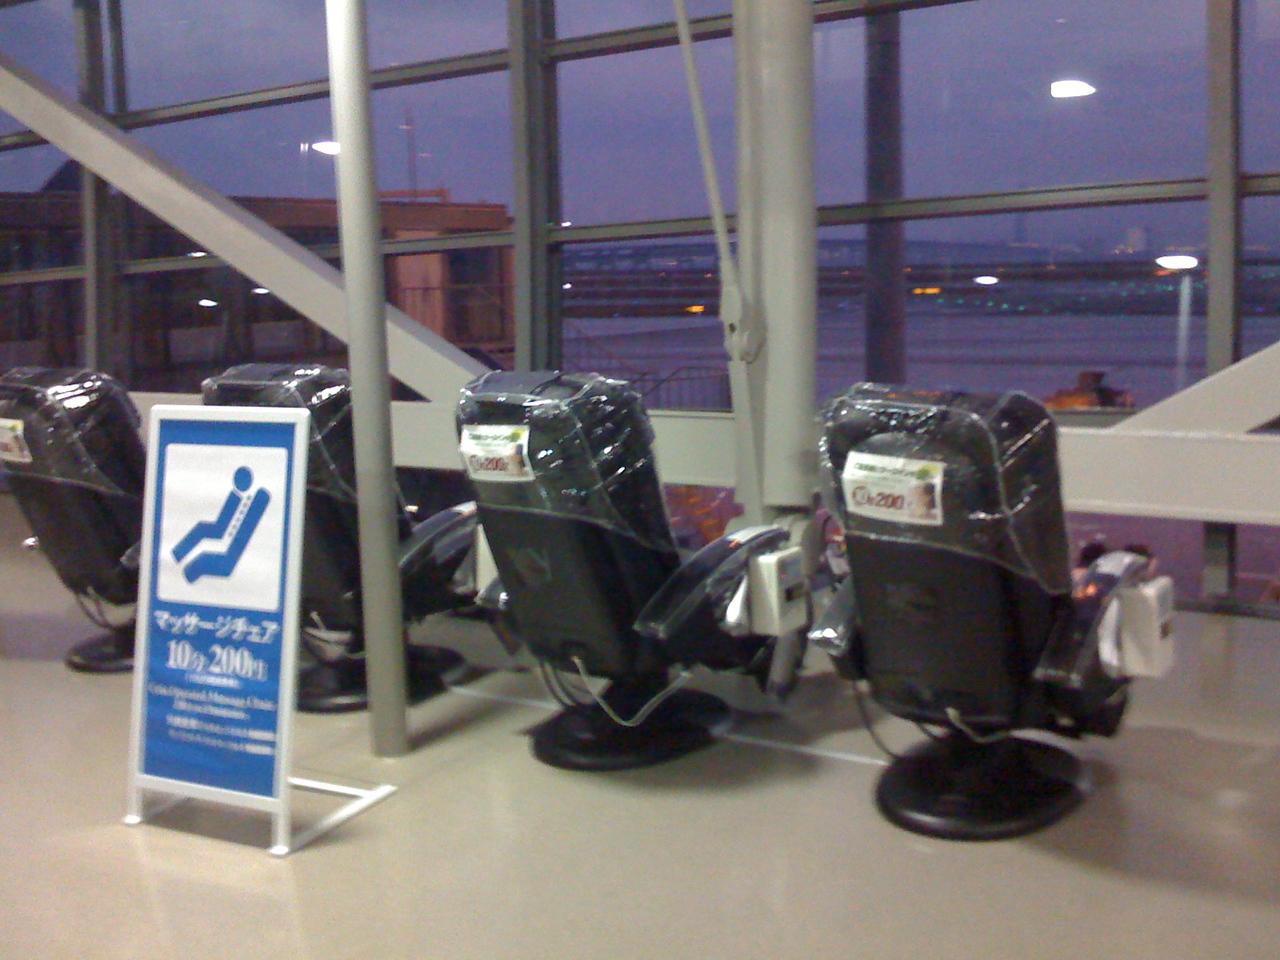 2008 11 24 Mon - Auto-massage chairs in Osaka, Japan airport